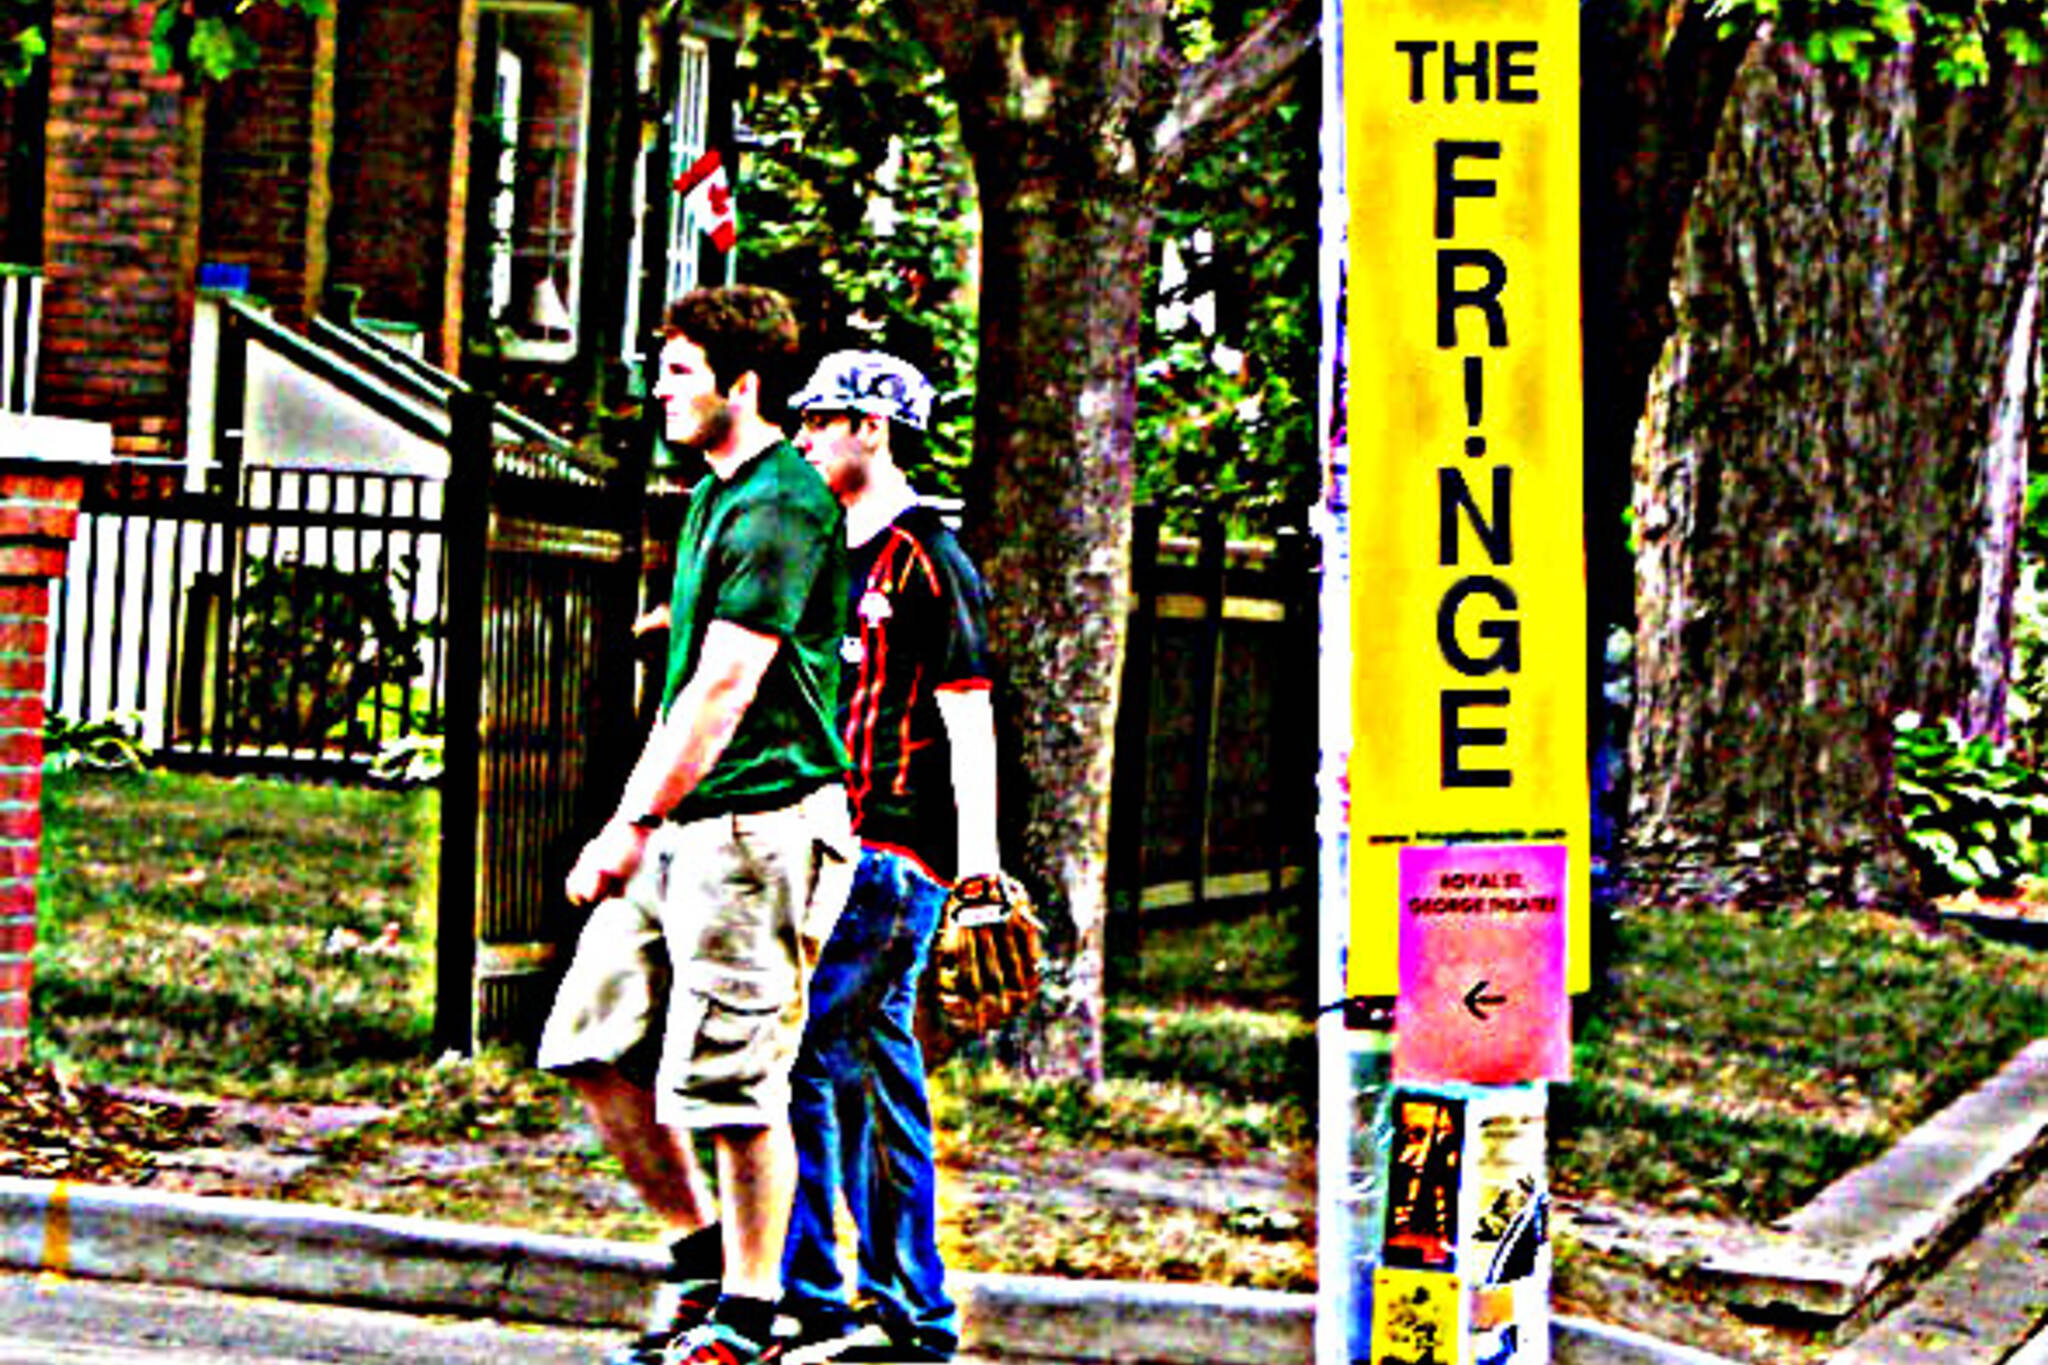 20070708_thefringe1overshar.jpg